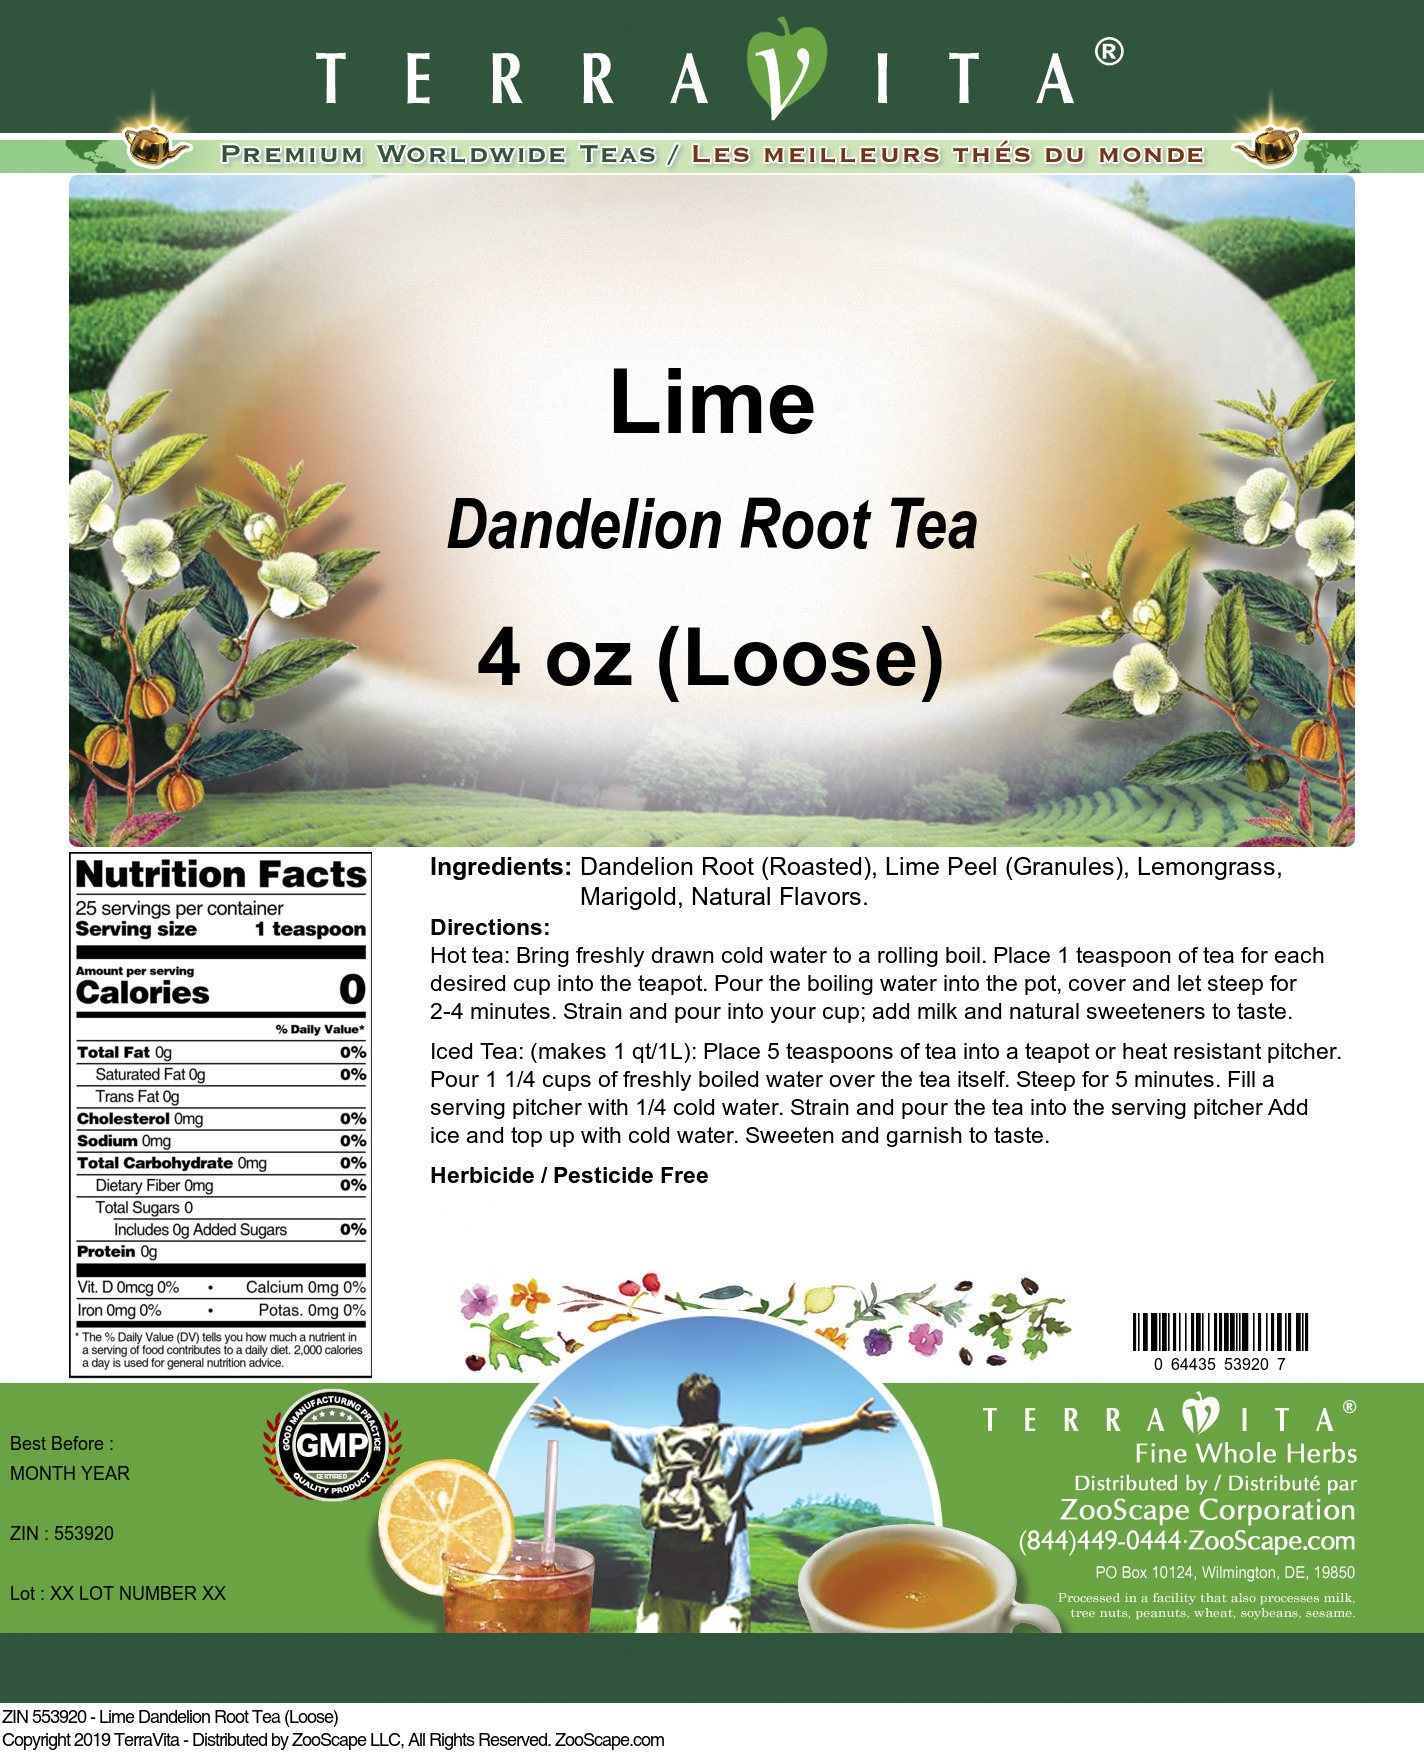 Lime Dandelion Root